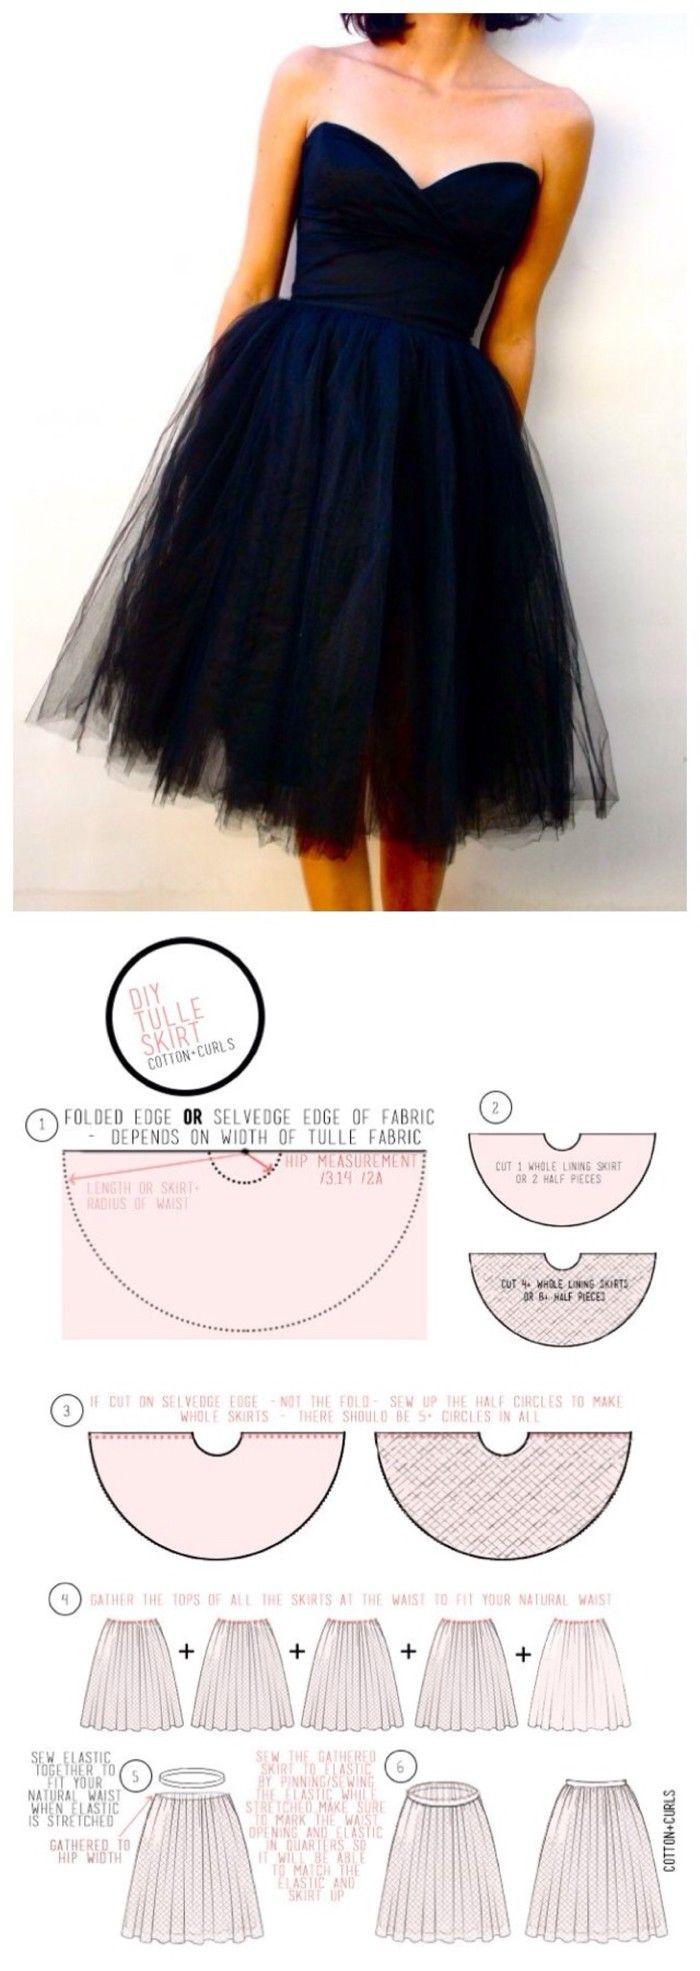 Шьем юбку балерины за 1 час. Идеи + МК